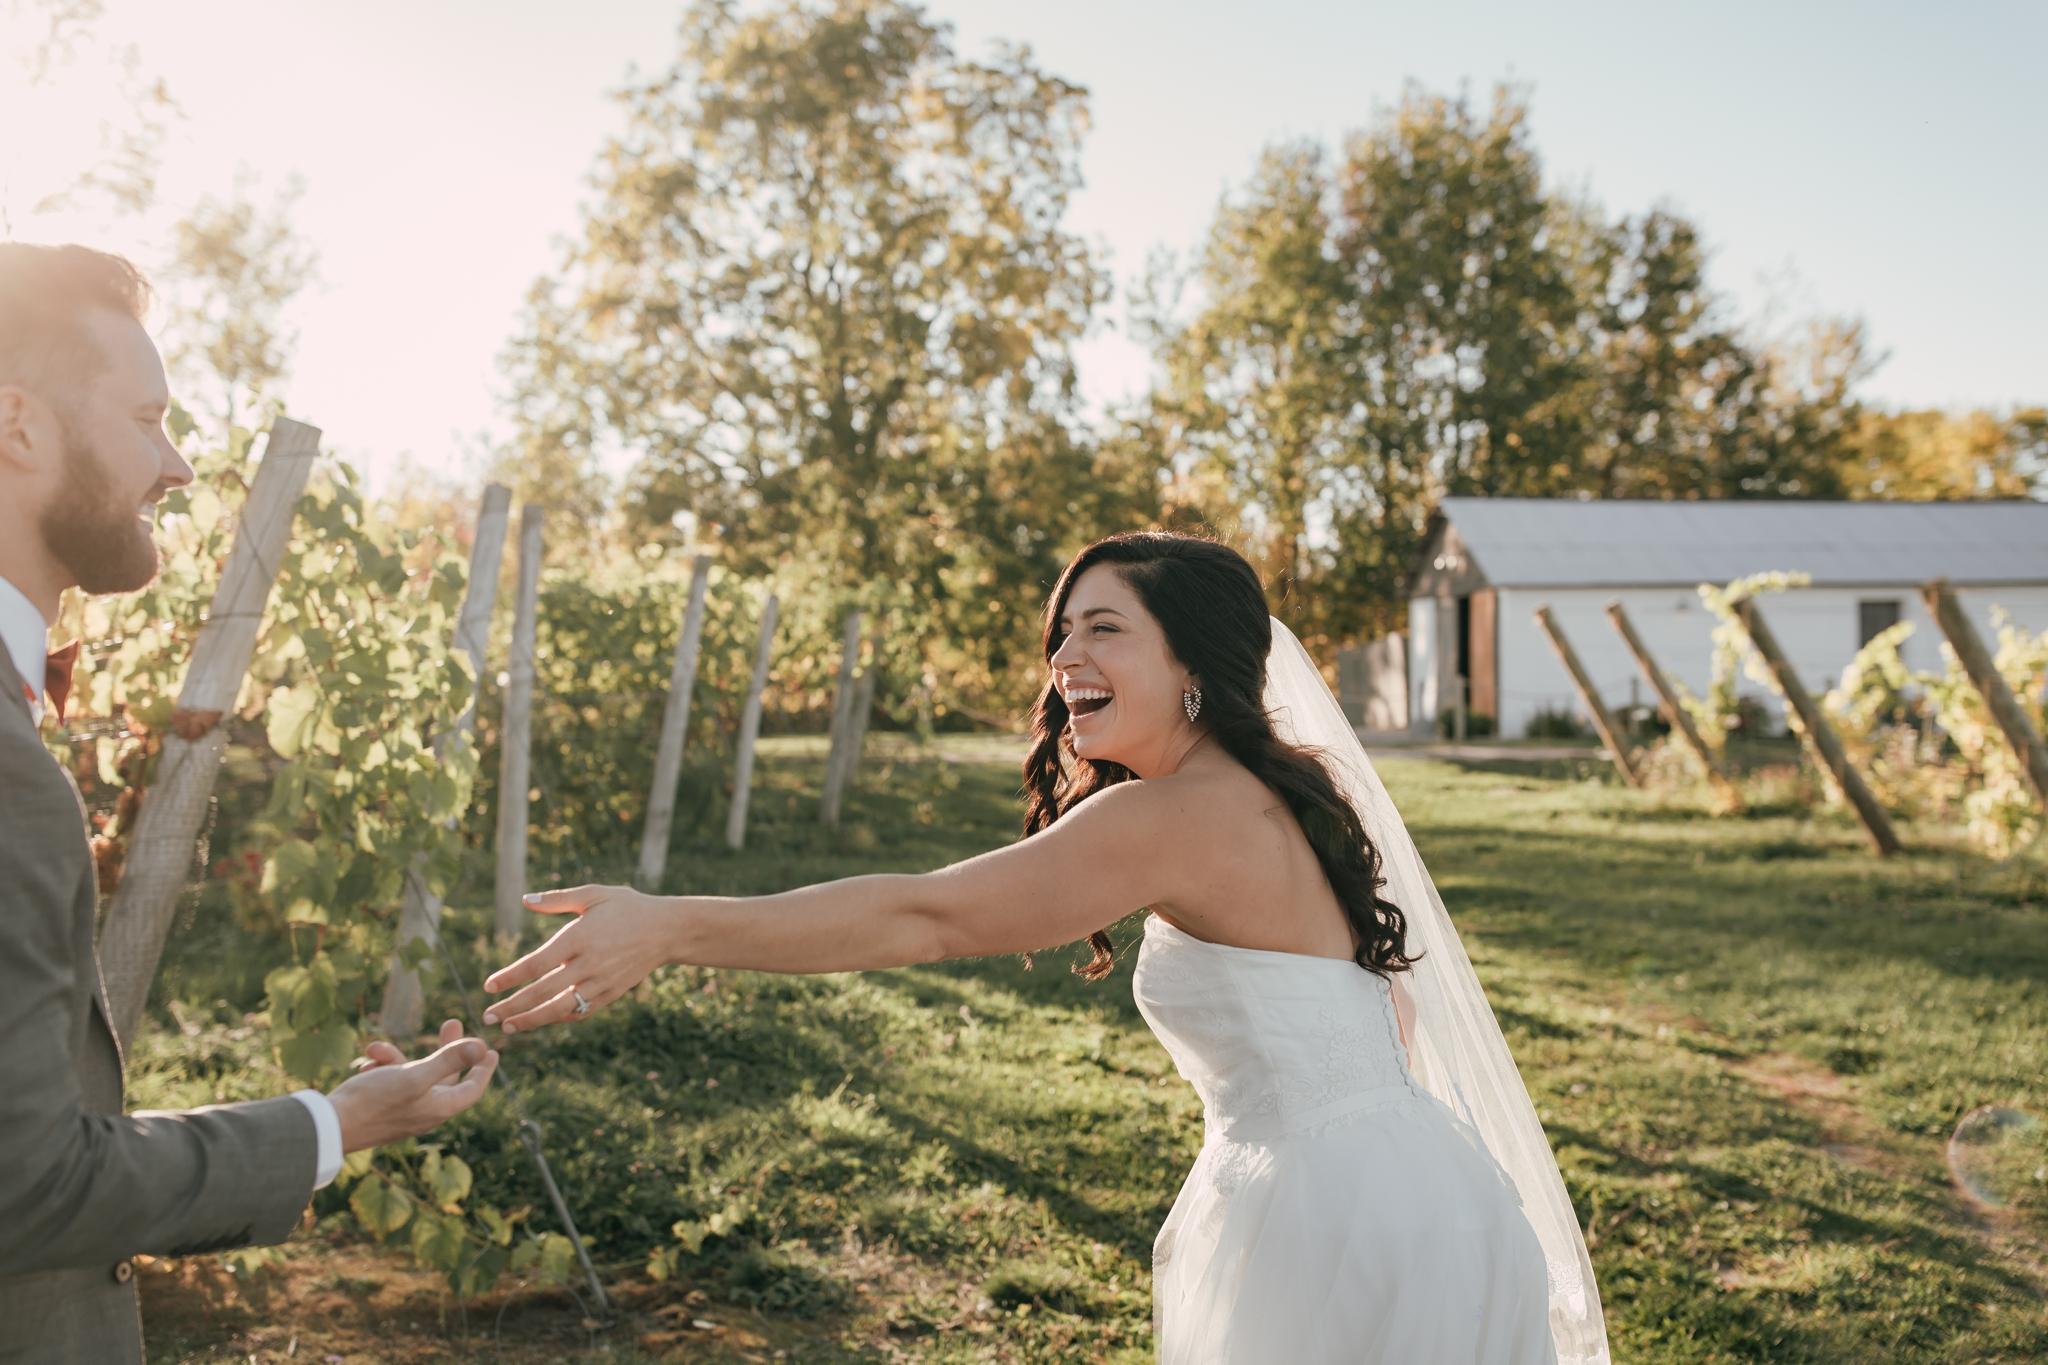 Heather-Nash-Photography-Aurora-Cellars-Wedding-Leelanau-Peninsula-Michigan_0146.jpg